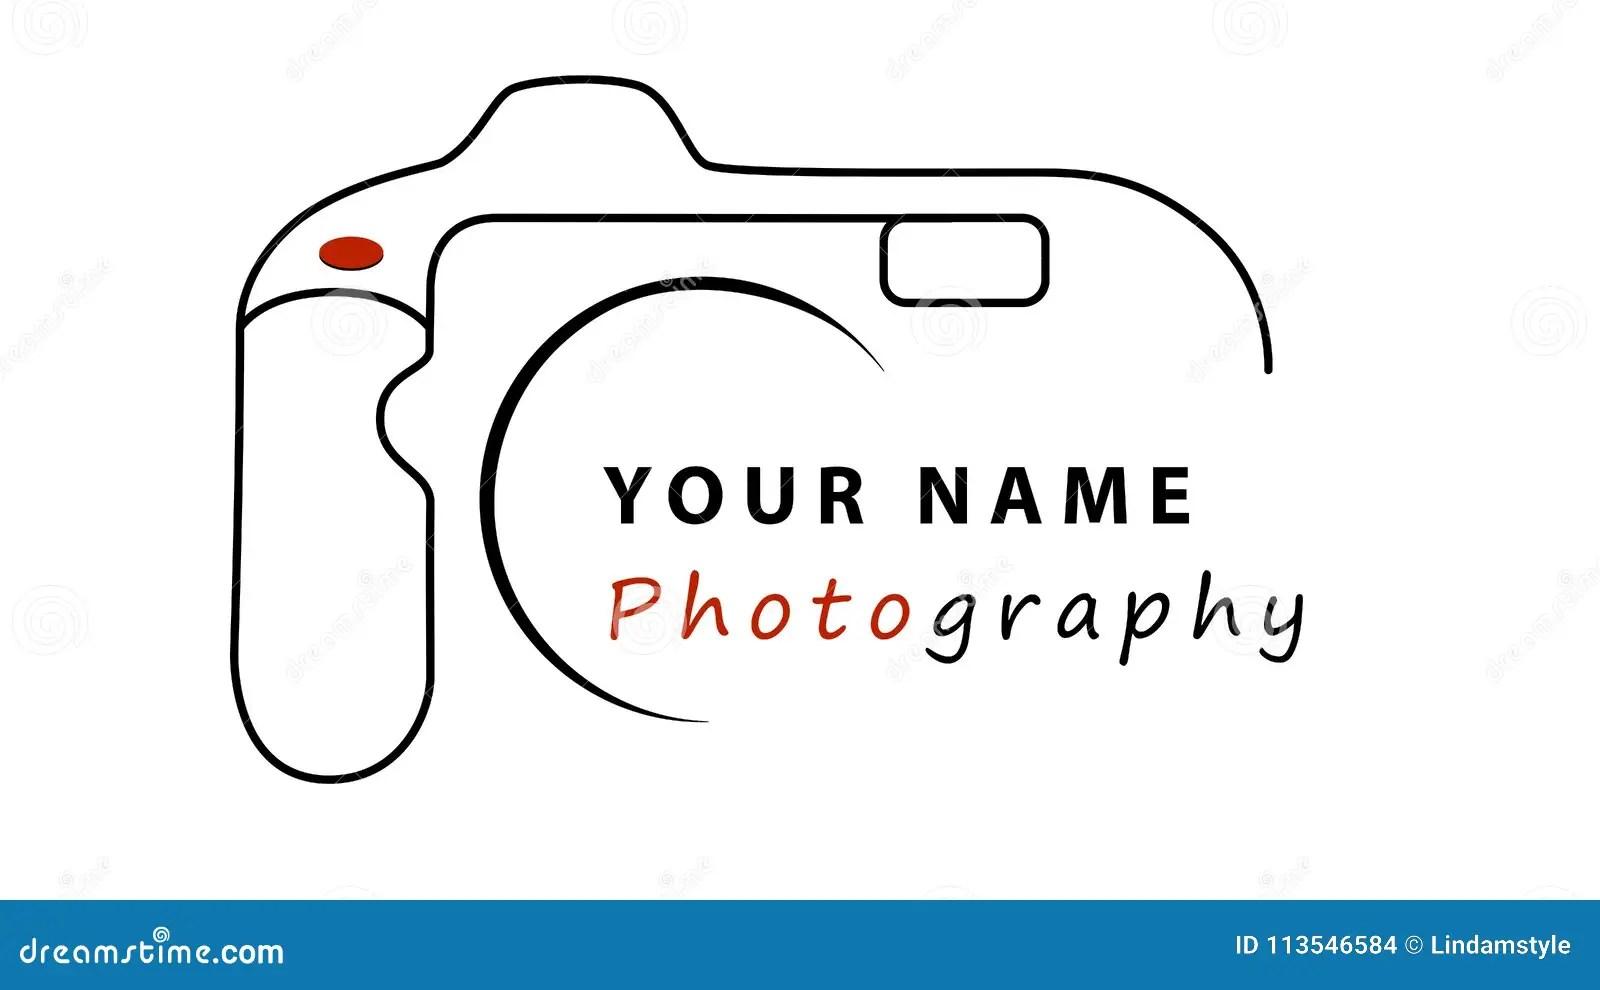 Photography Business Logo Design Stock Illustration